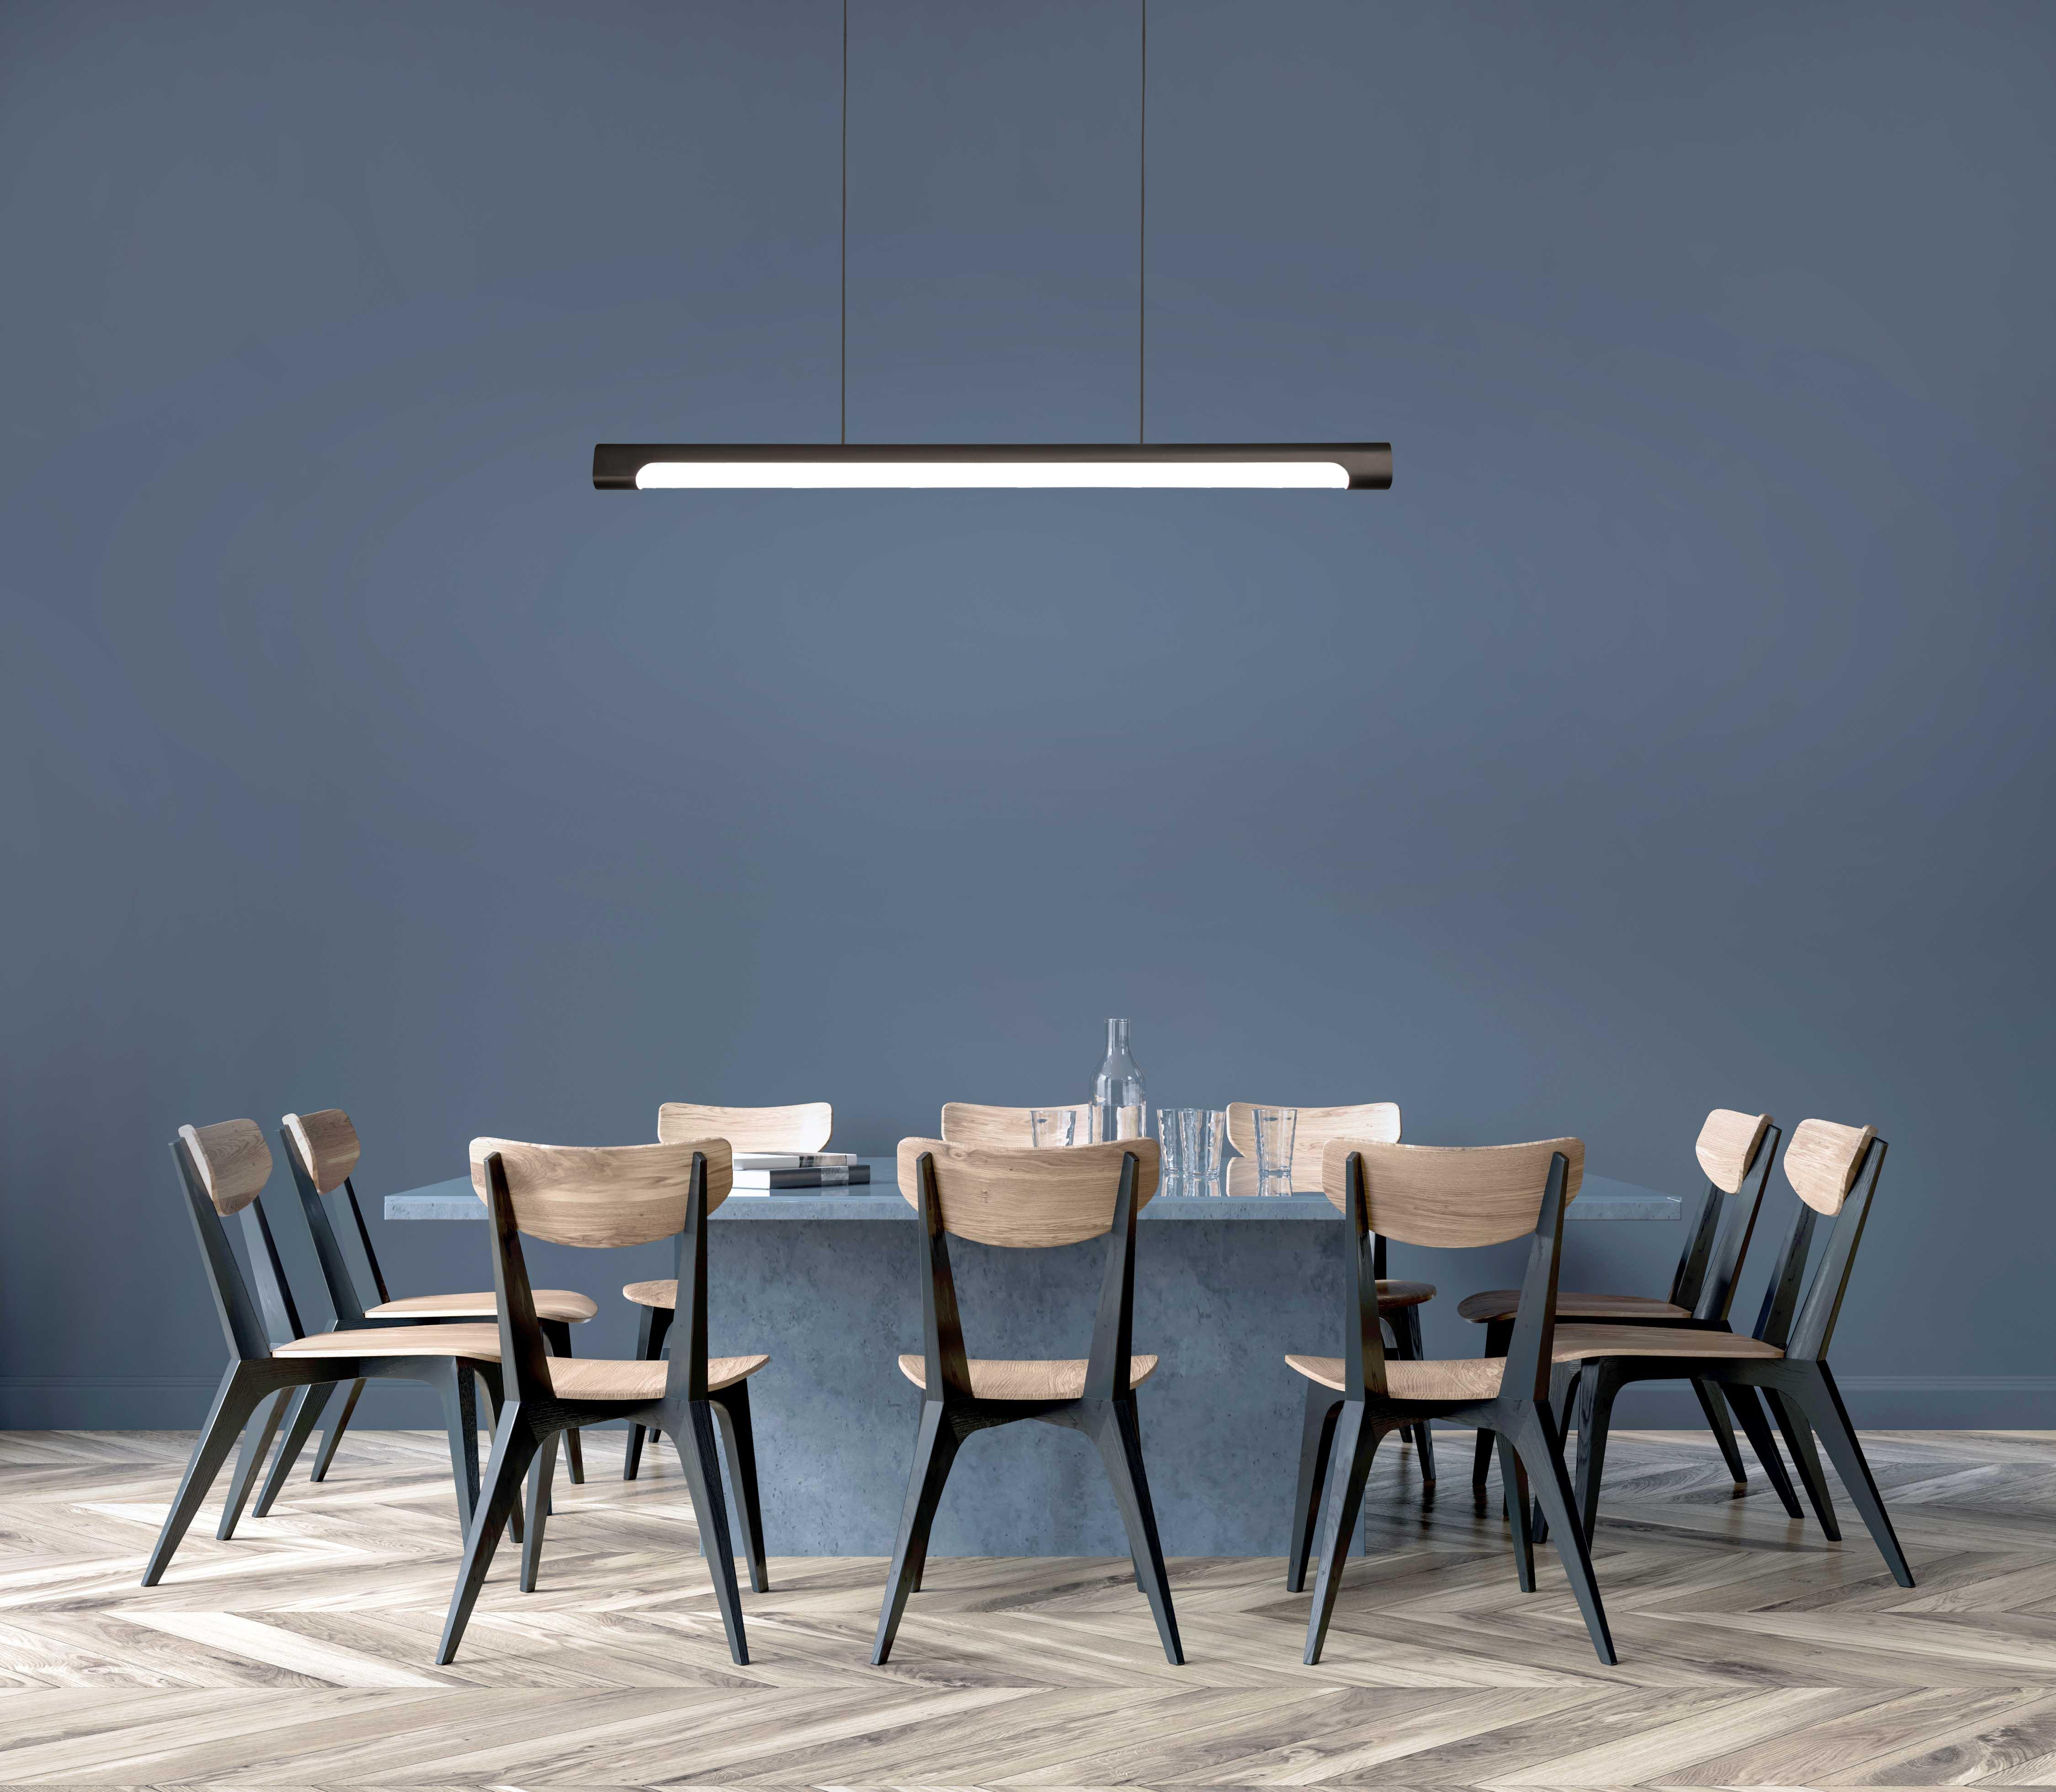 6ft LED linear pendant light hung over table